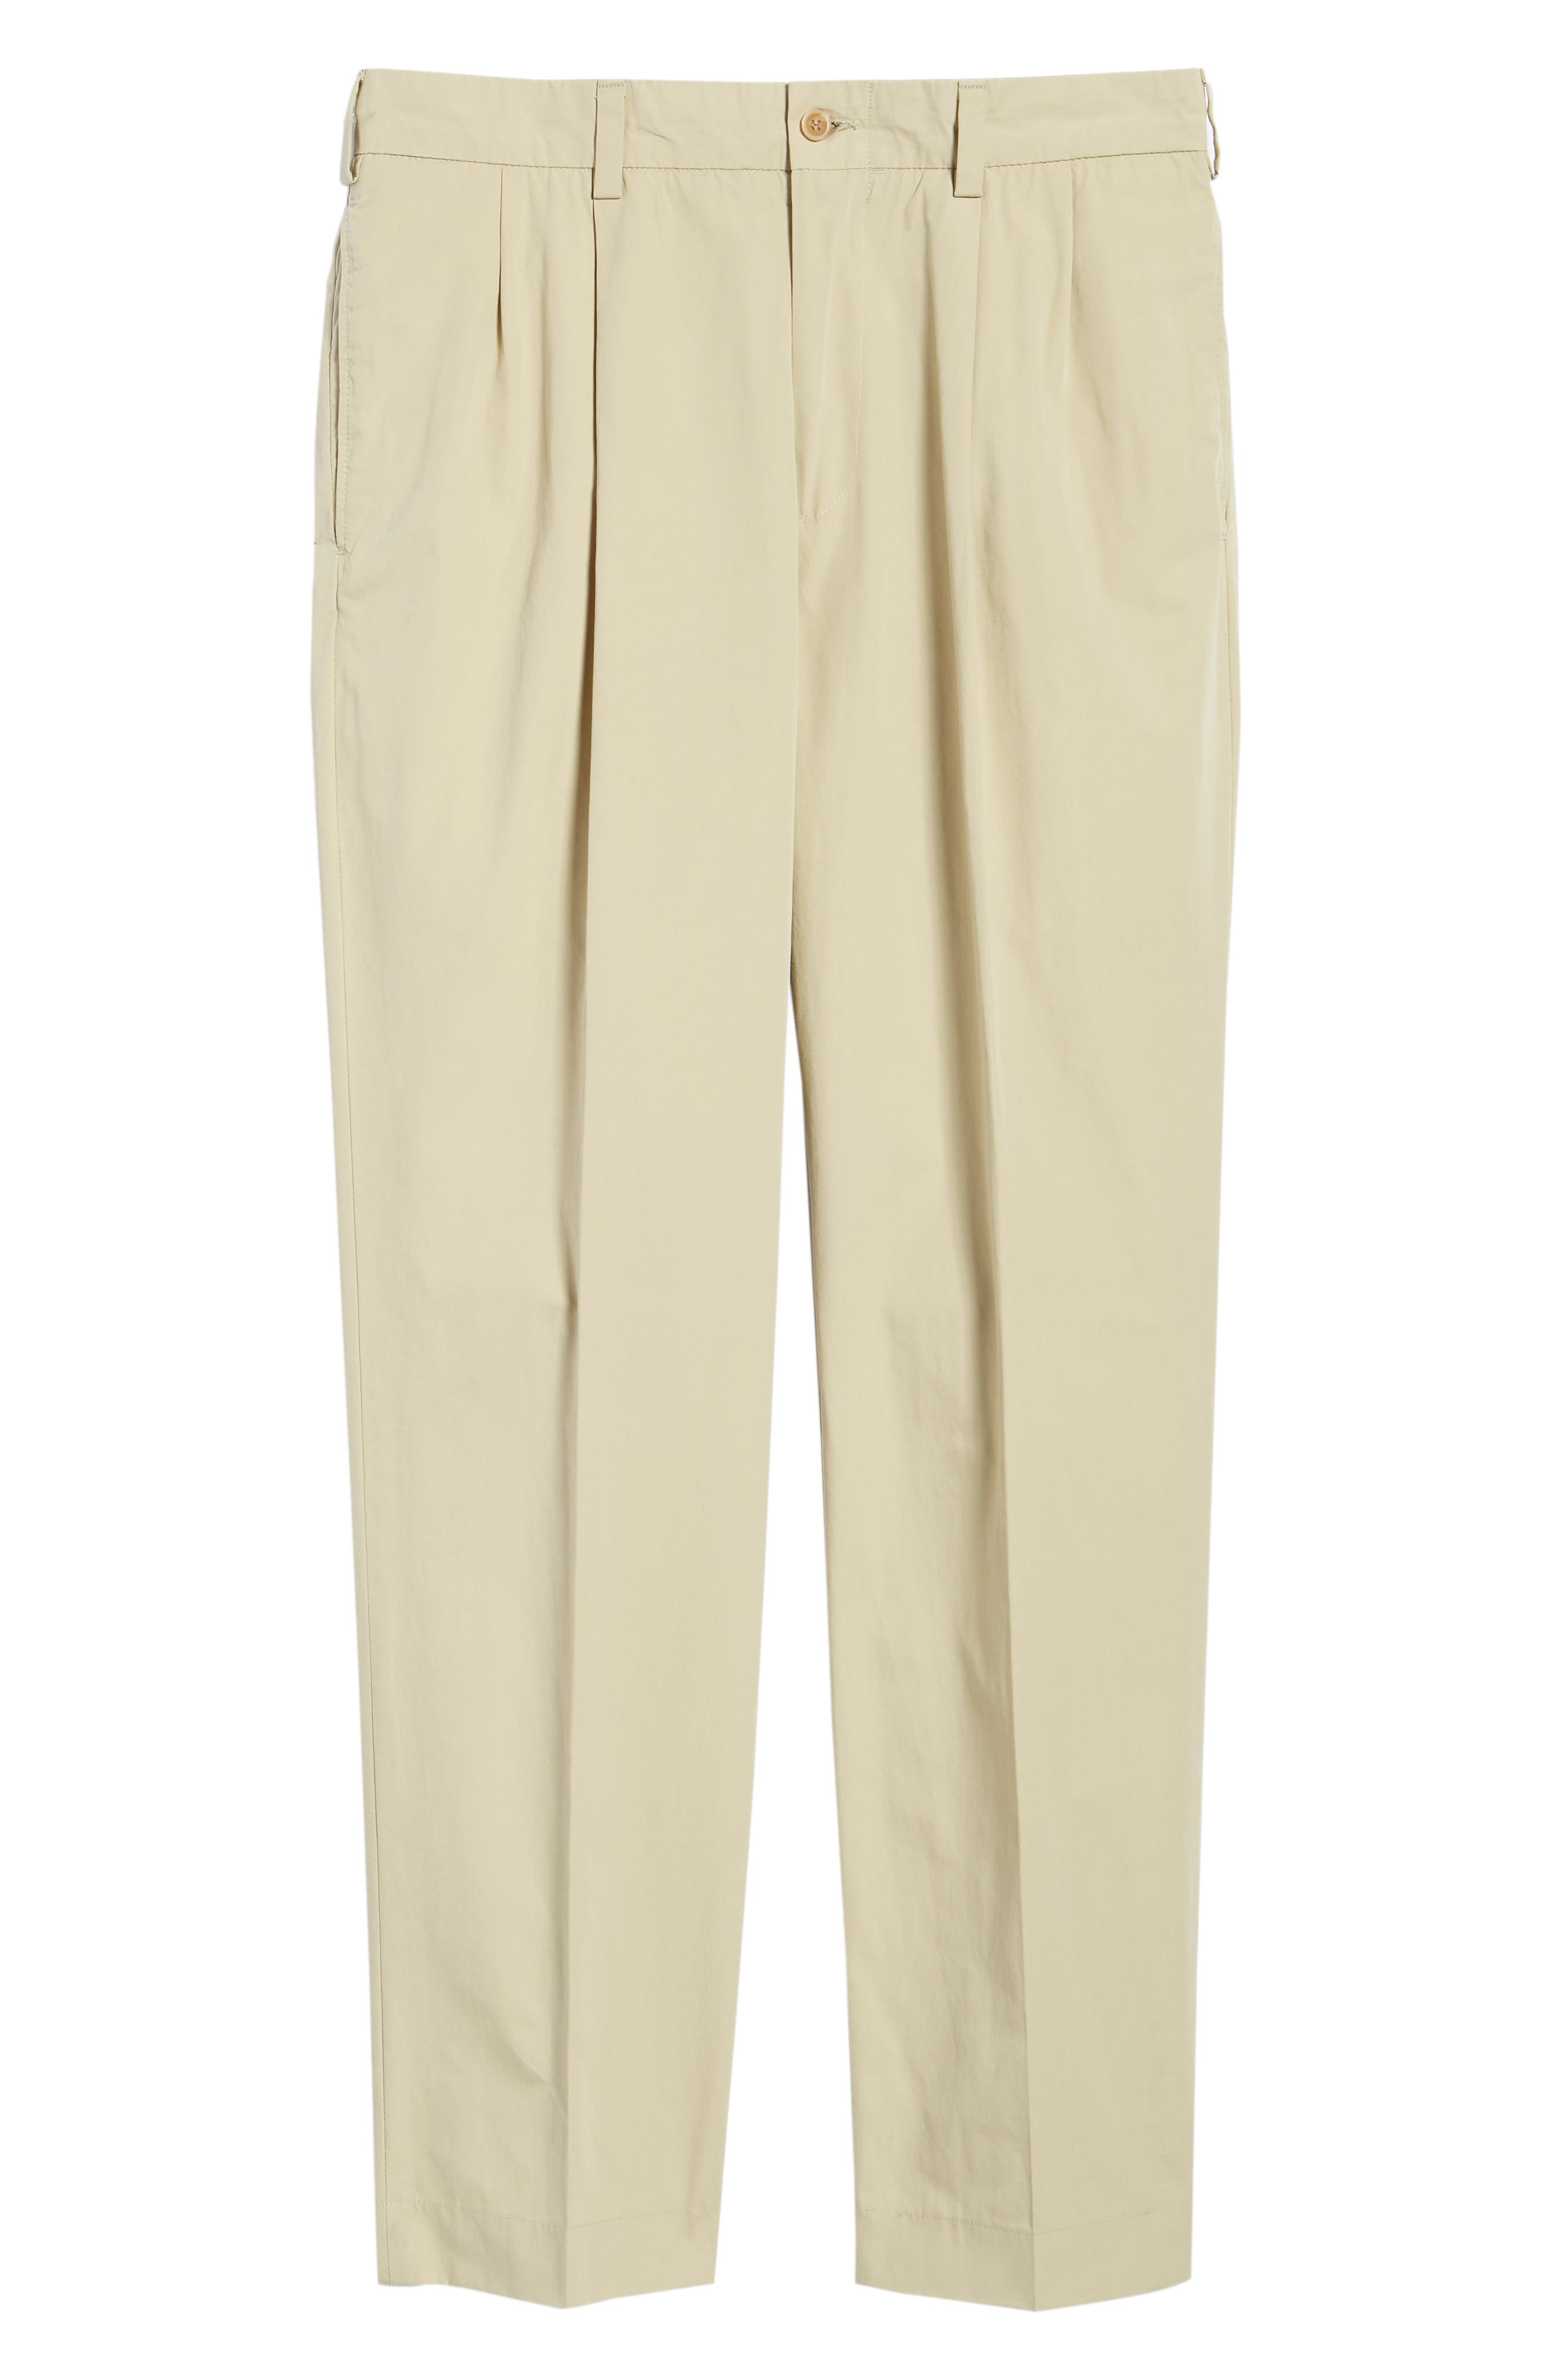 M2 Classic Fit Pleated Tropical Cotton Poplin Pants,                             Alternate thumbnail 6, color,                             Khaki